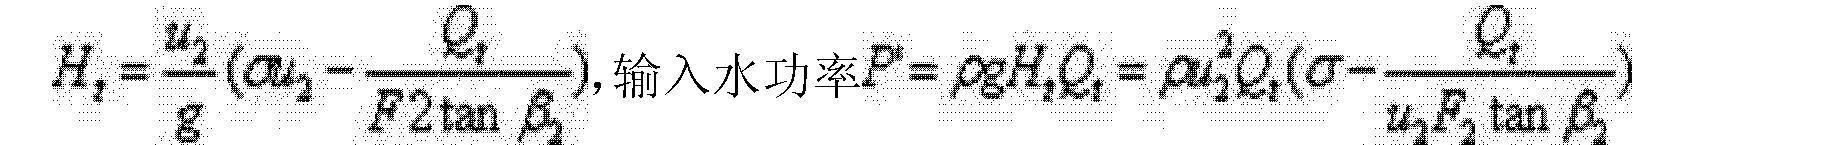 Figure CN203685691UD00043